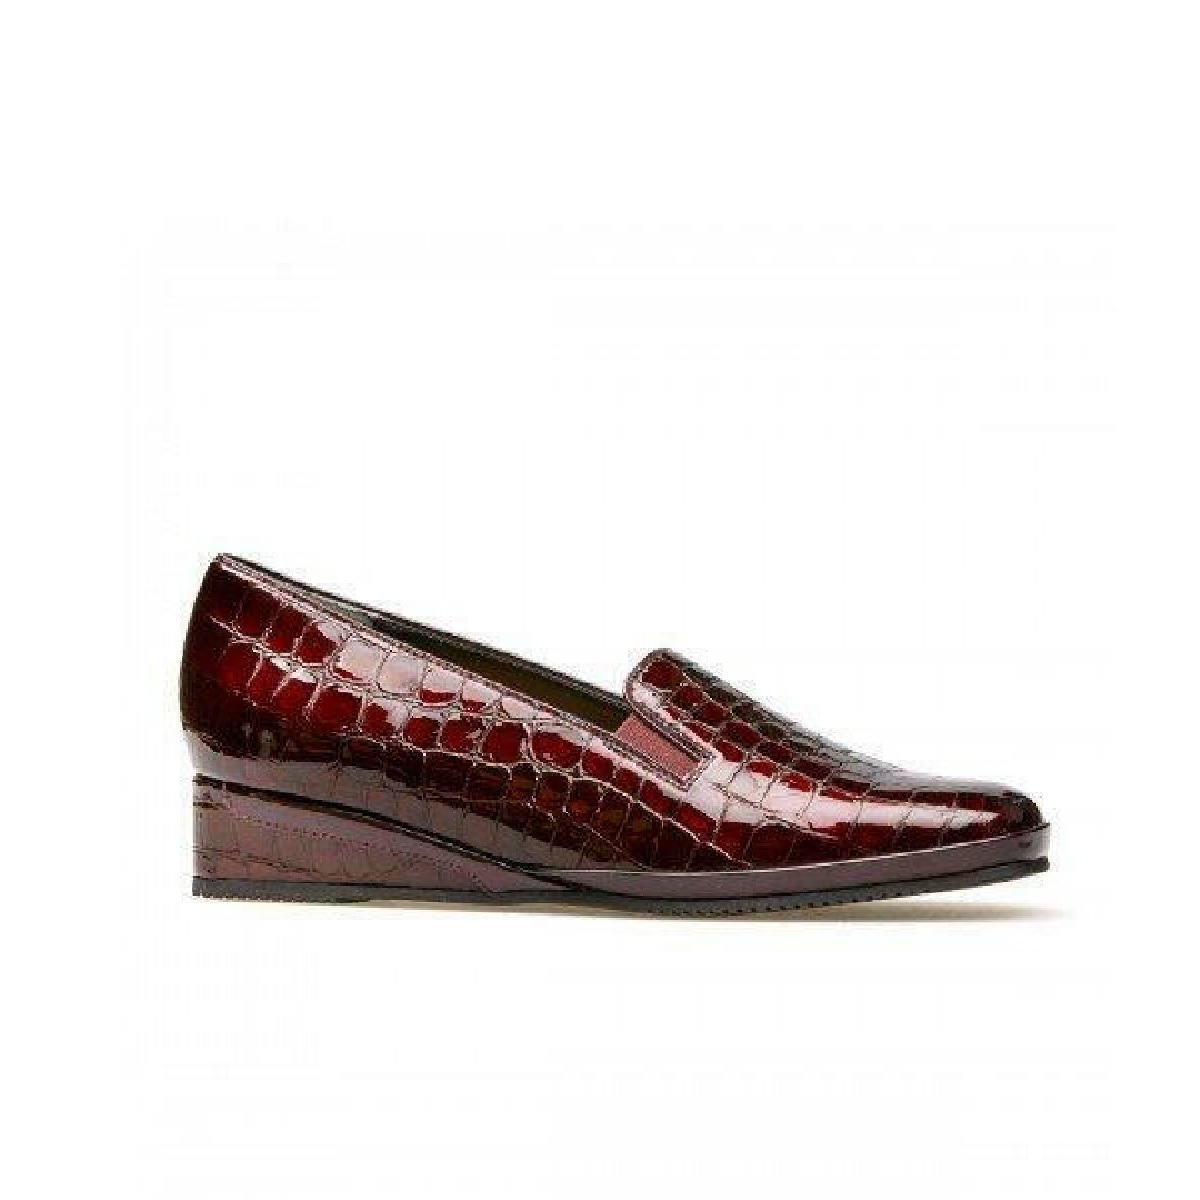 Van Dal Ladies Rochester Garnet Patent Croc Leather